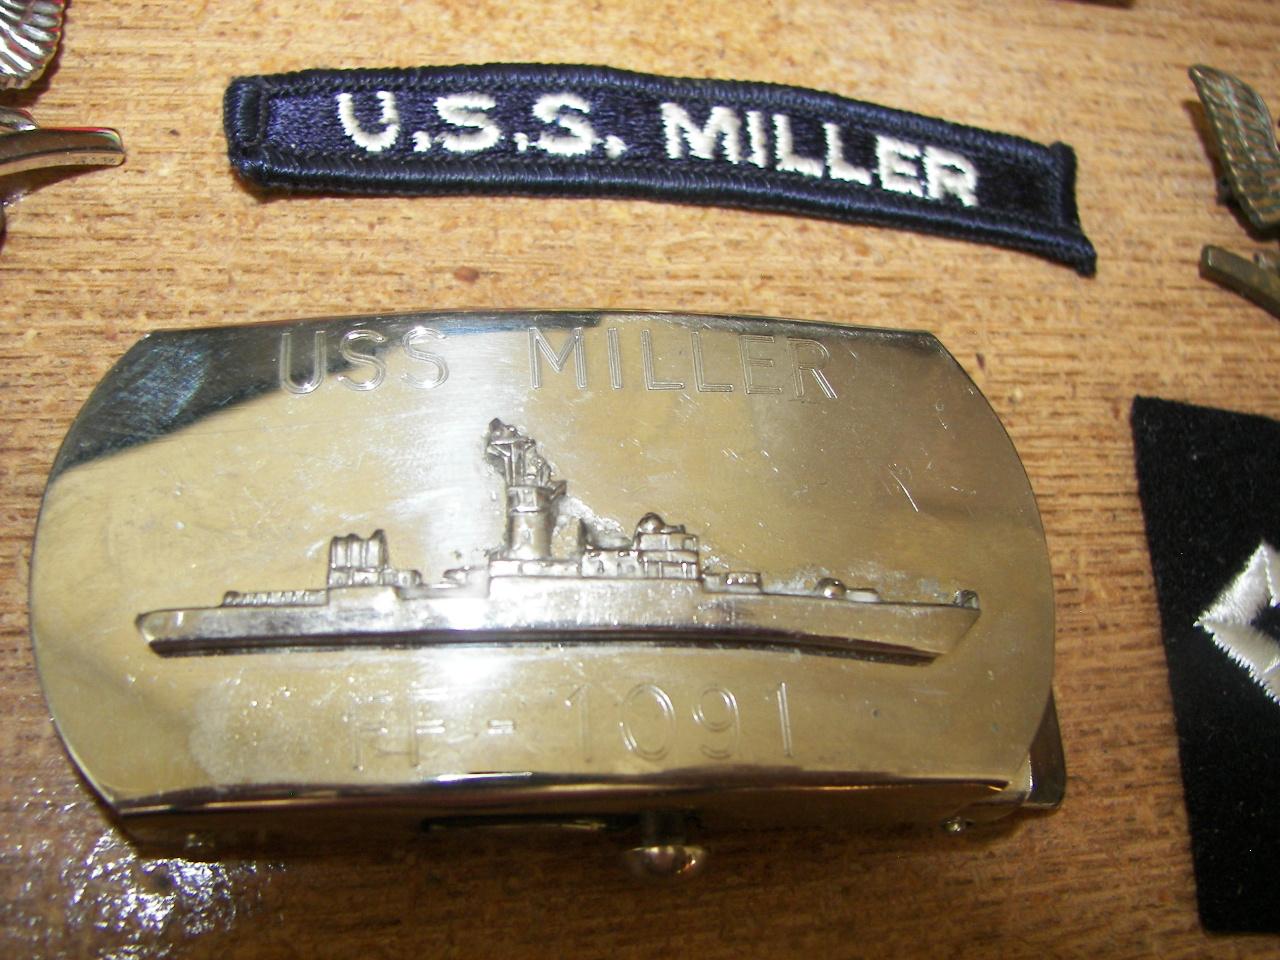 Shoulder patch and Belt buckel for USS Miller 1091